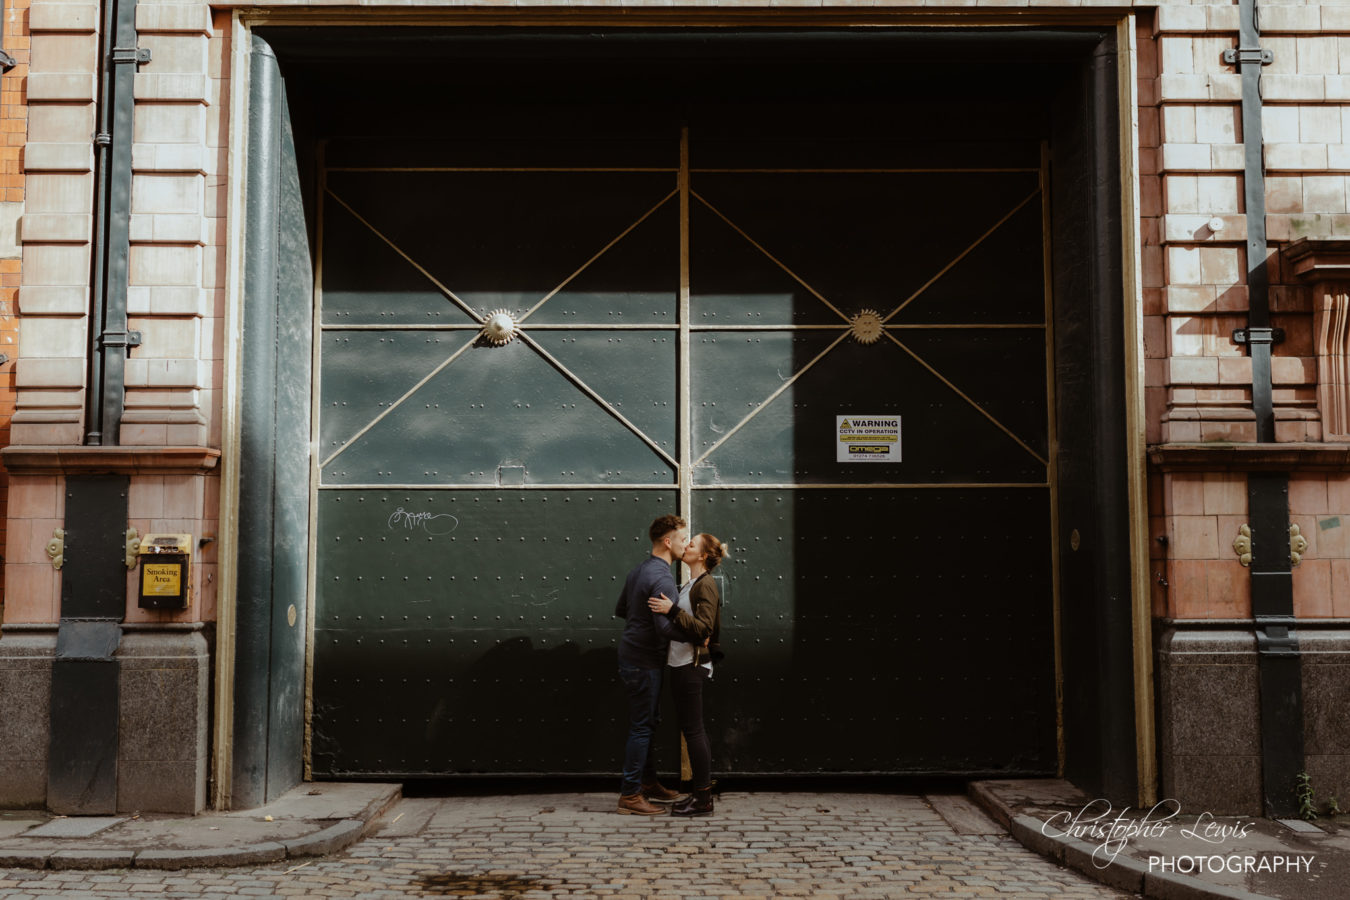 Northern-Quarter-Manchester-Pre-Wedding-Photoshoot-22